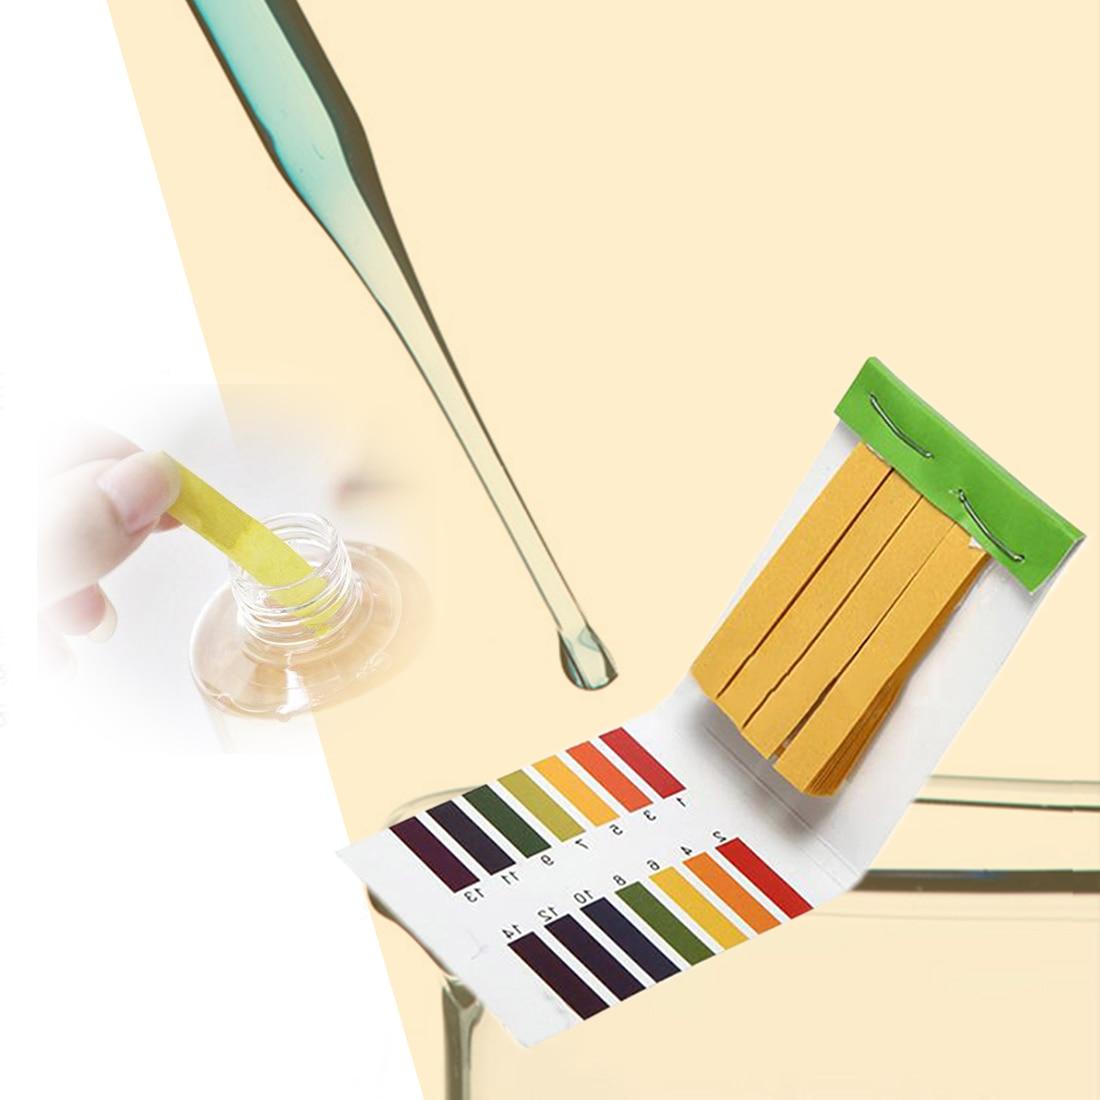 PH Meters PH Test Strips 80 Strips Indicator Test Strips 1-14 Paper Litmus Tester insta test lamotte test strips insta test 3 way 2976